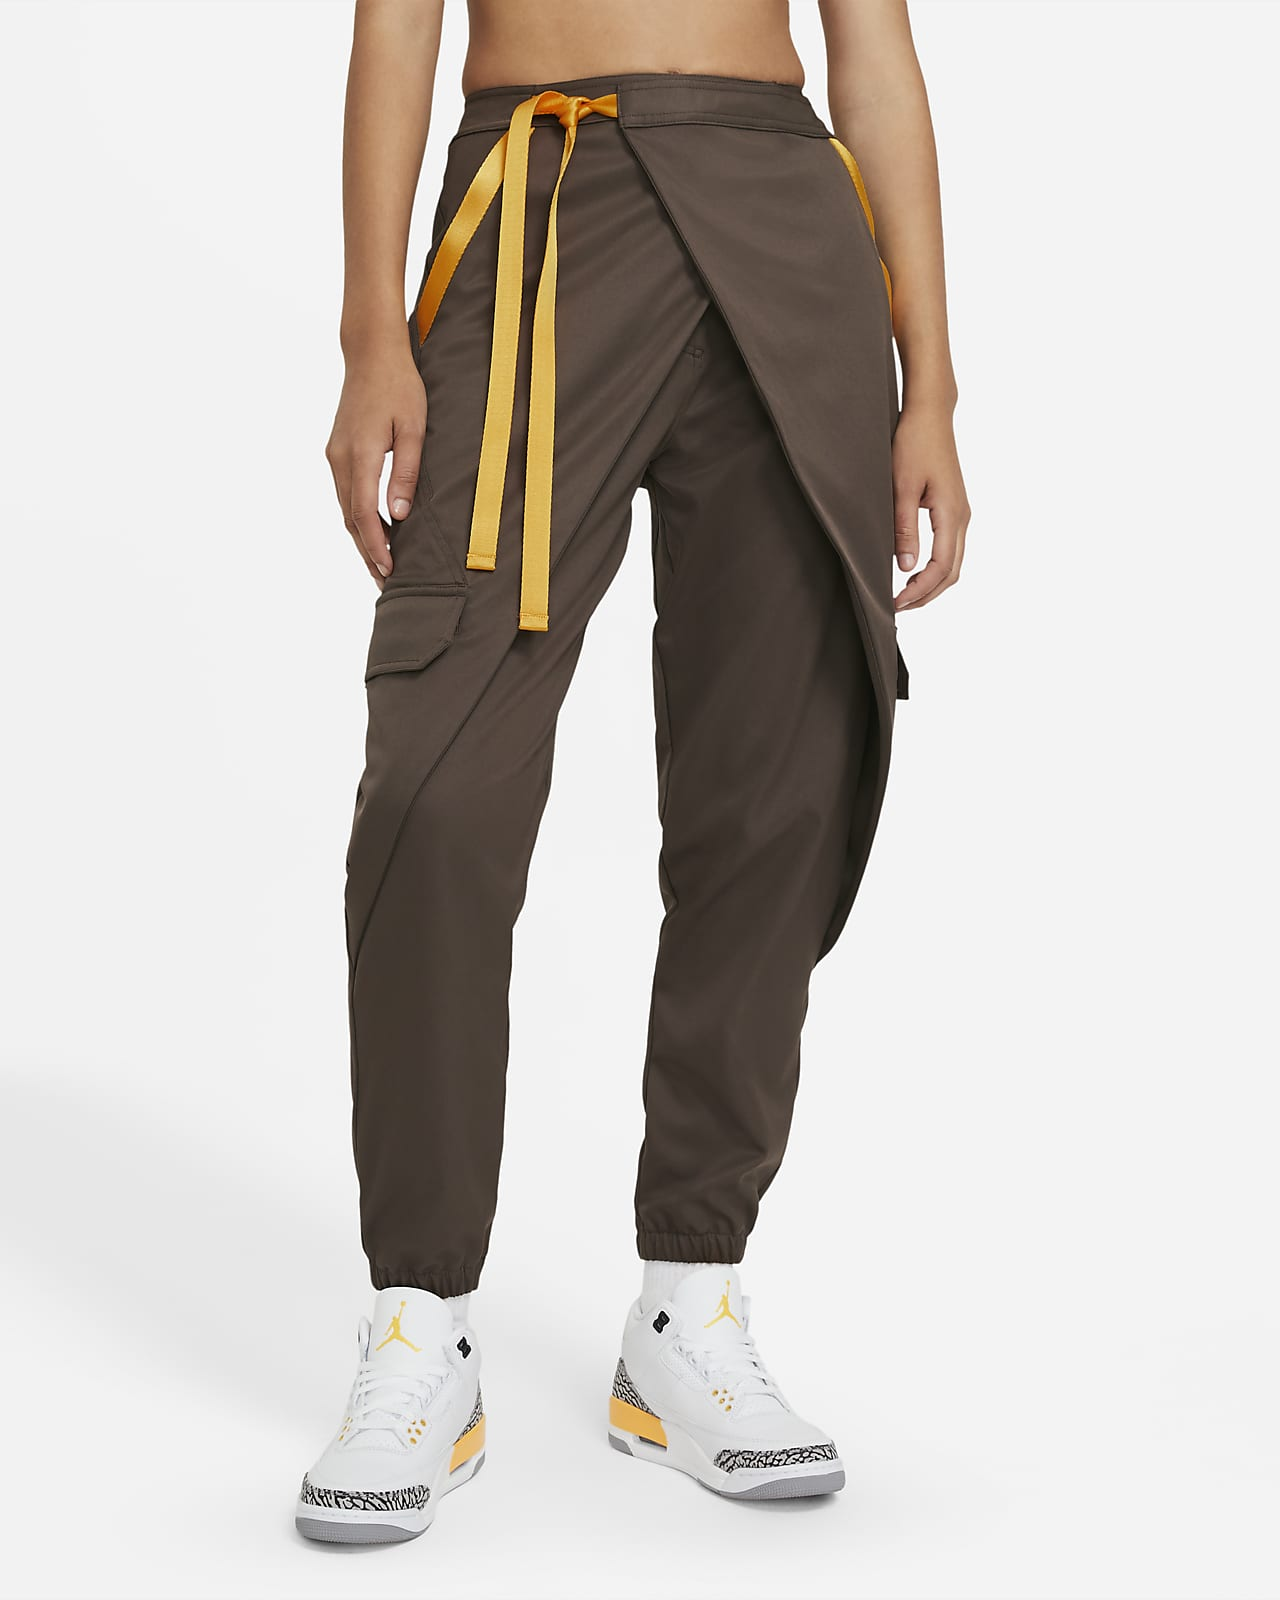 Jordan Future Primal Women's Utility Pants